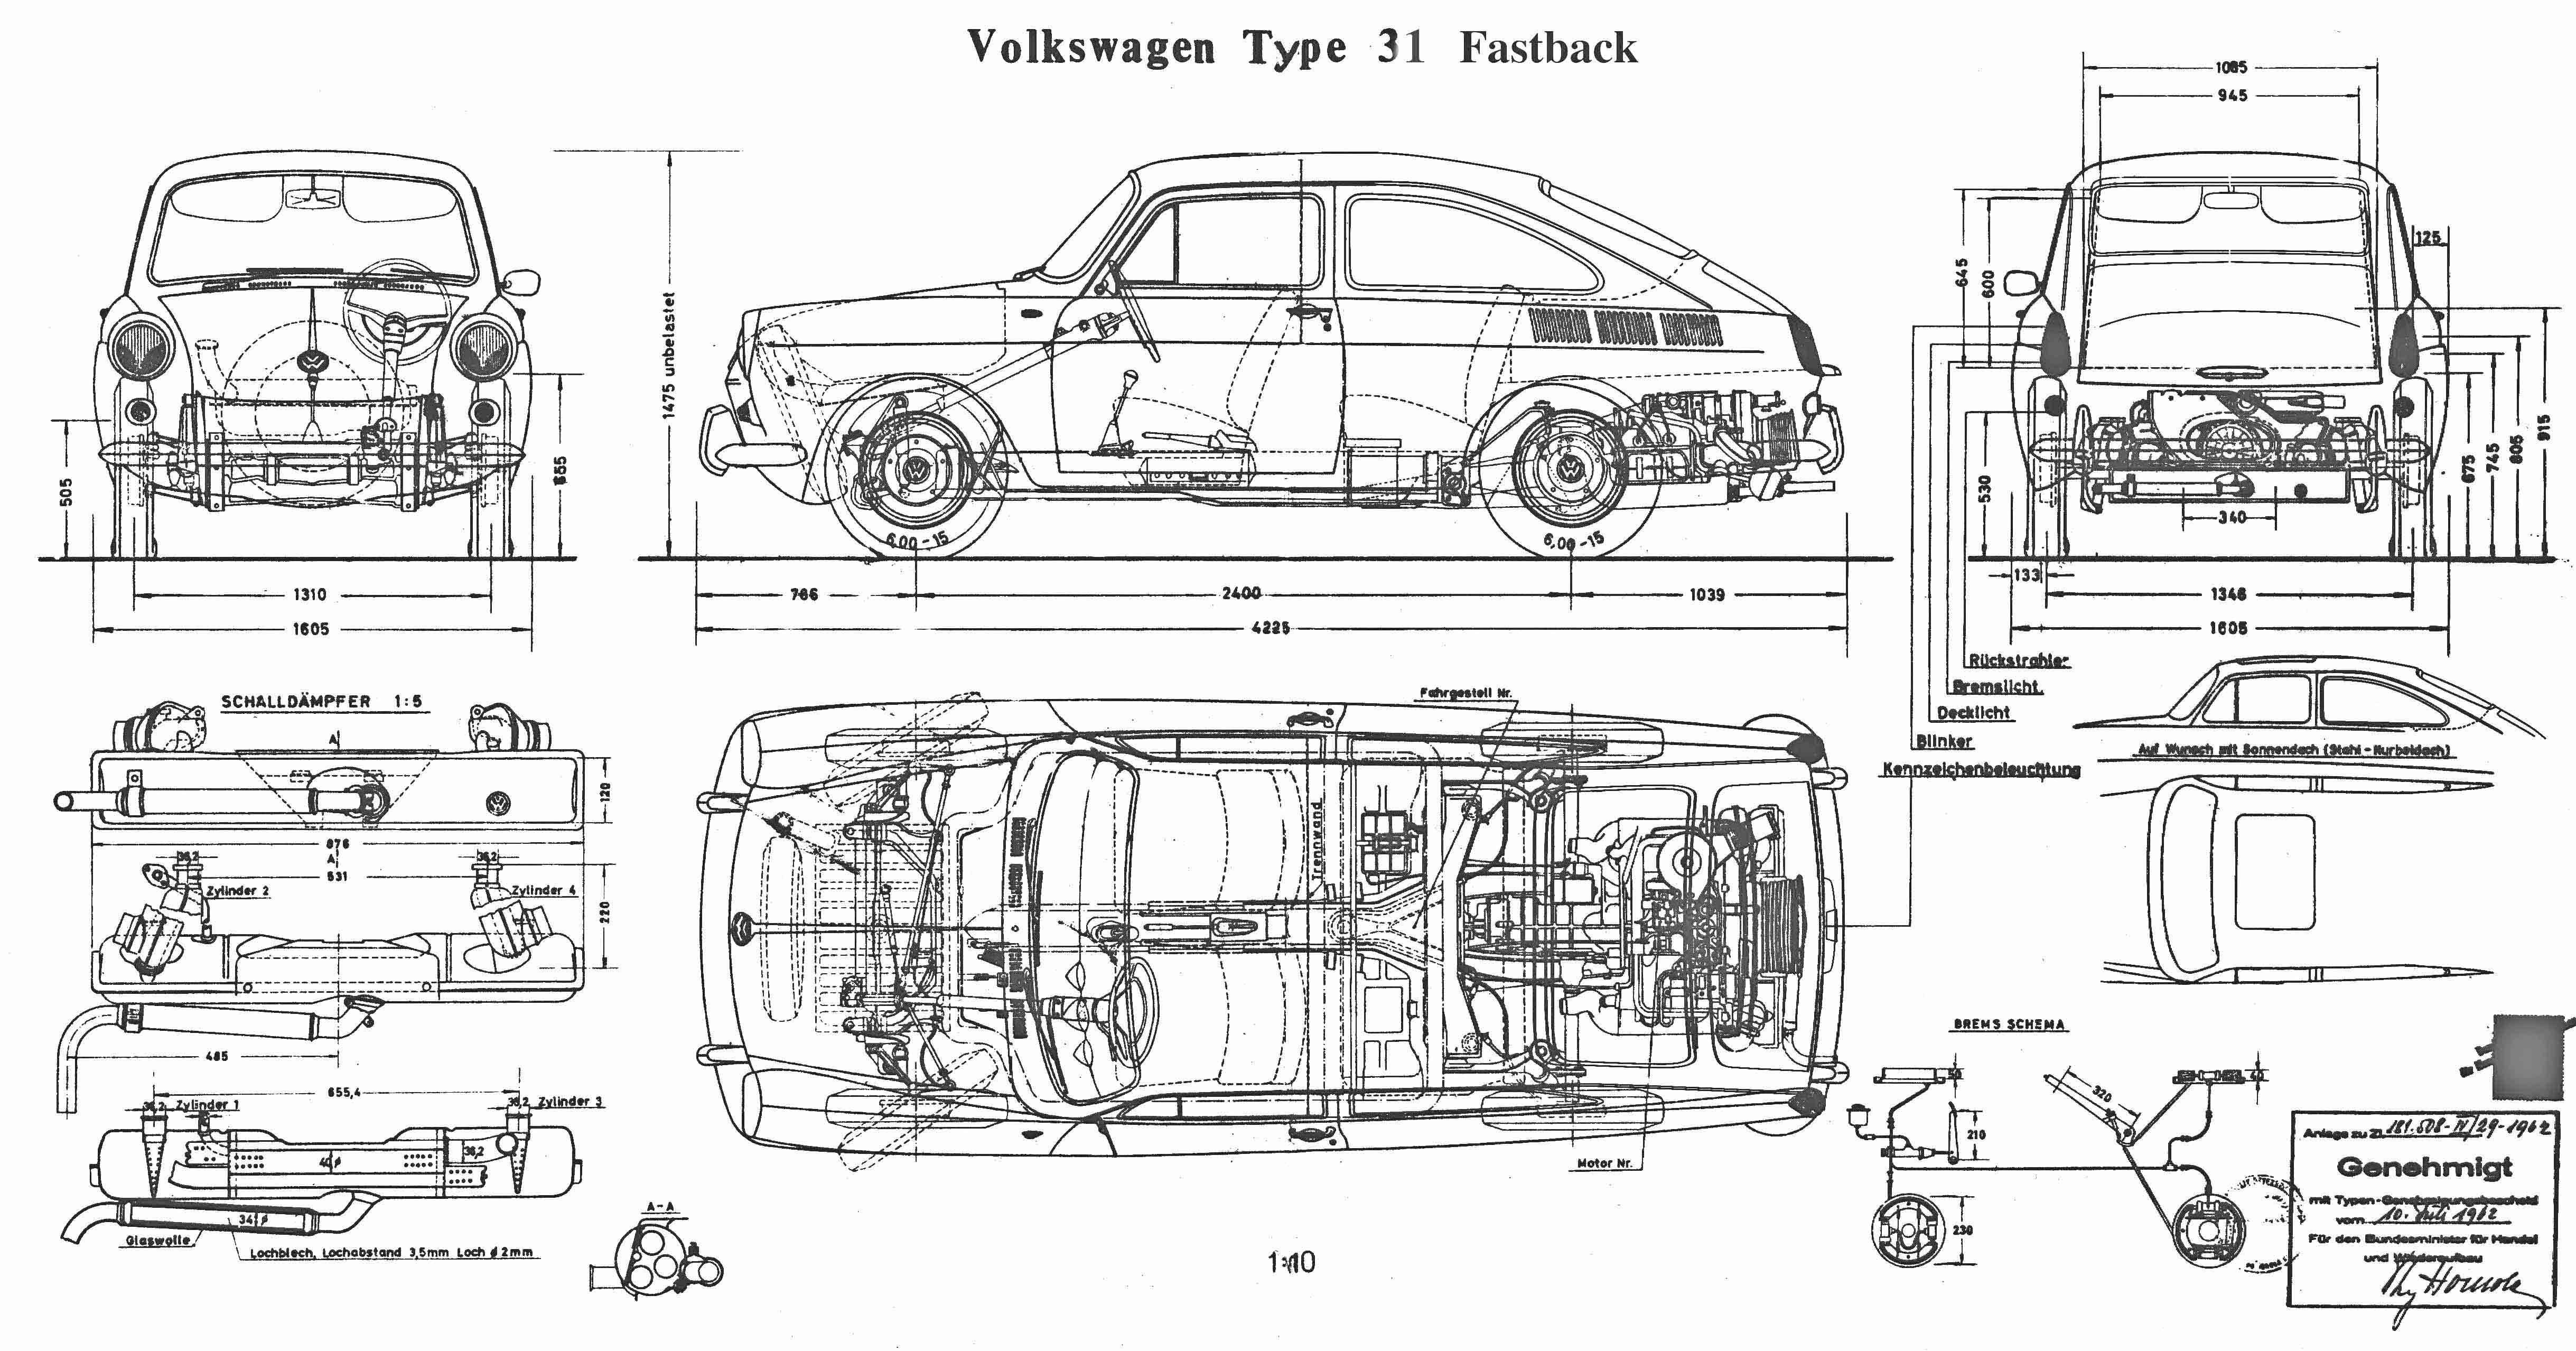 Volkswagen Typ 31 Fastback Smcars